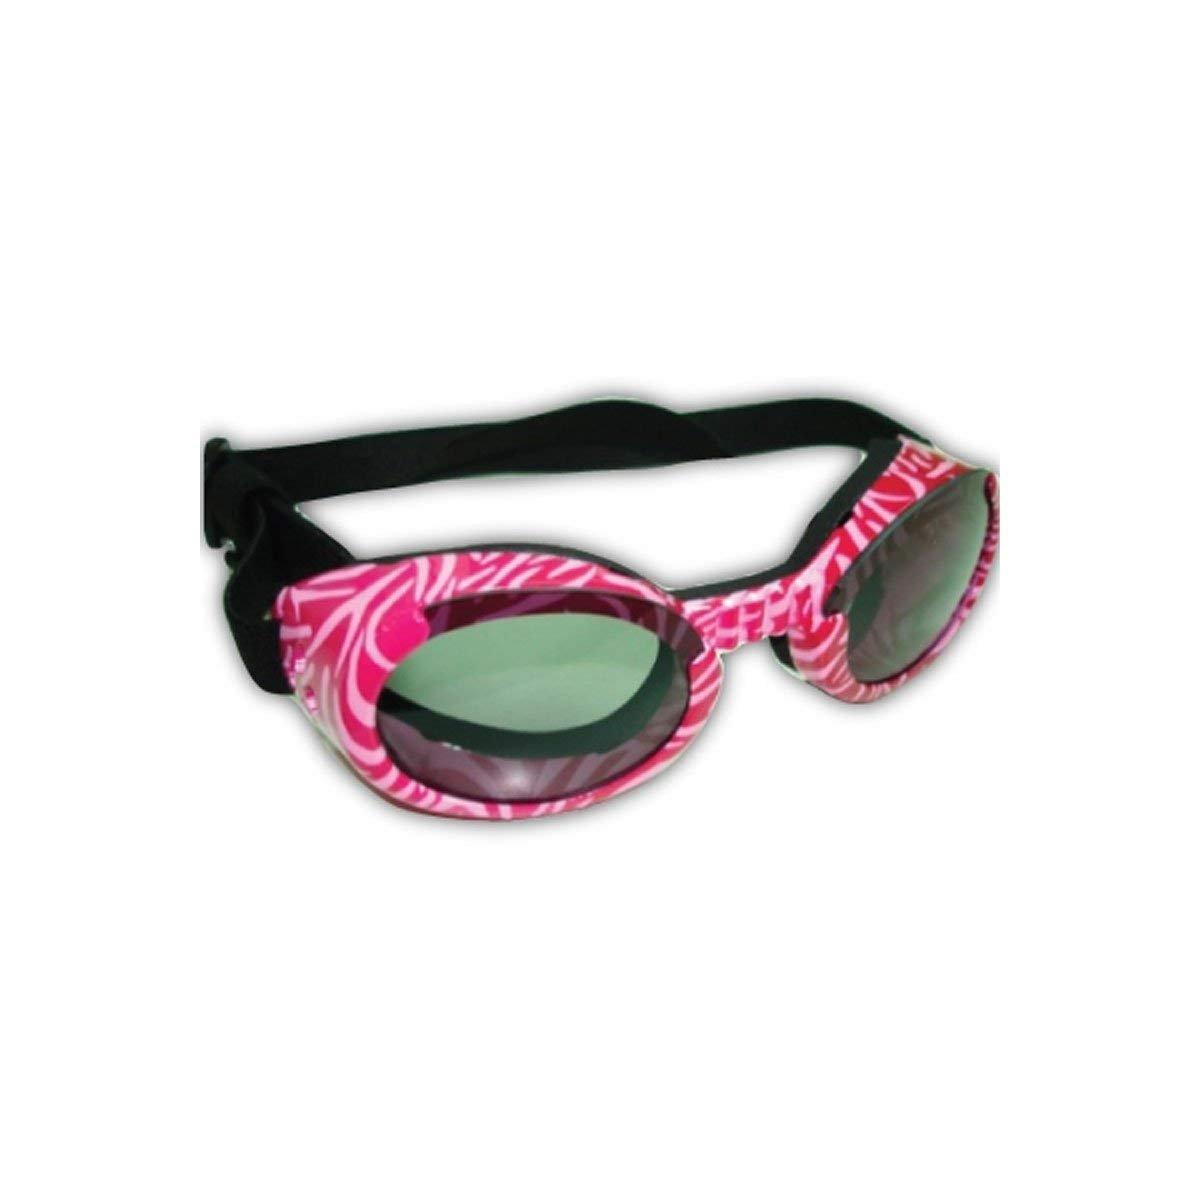 Doggles ILS Sunglass, X-Small, Pink Zebra Frame/Smoke Lens